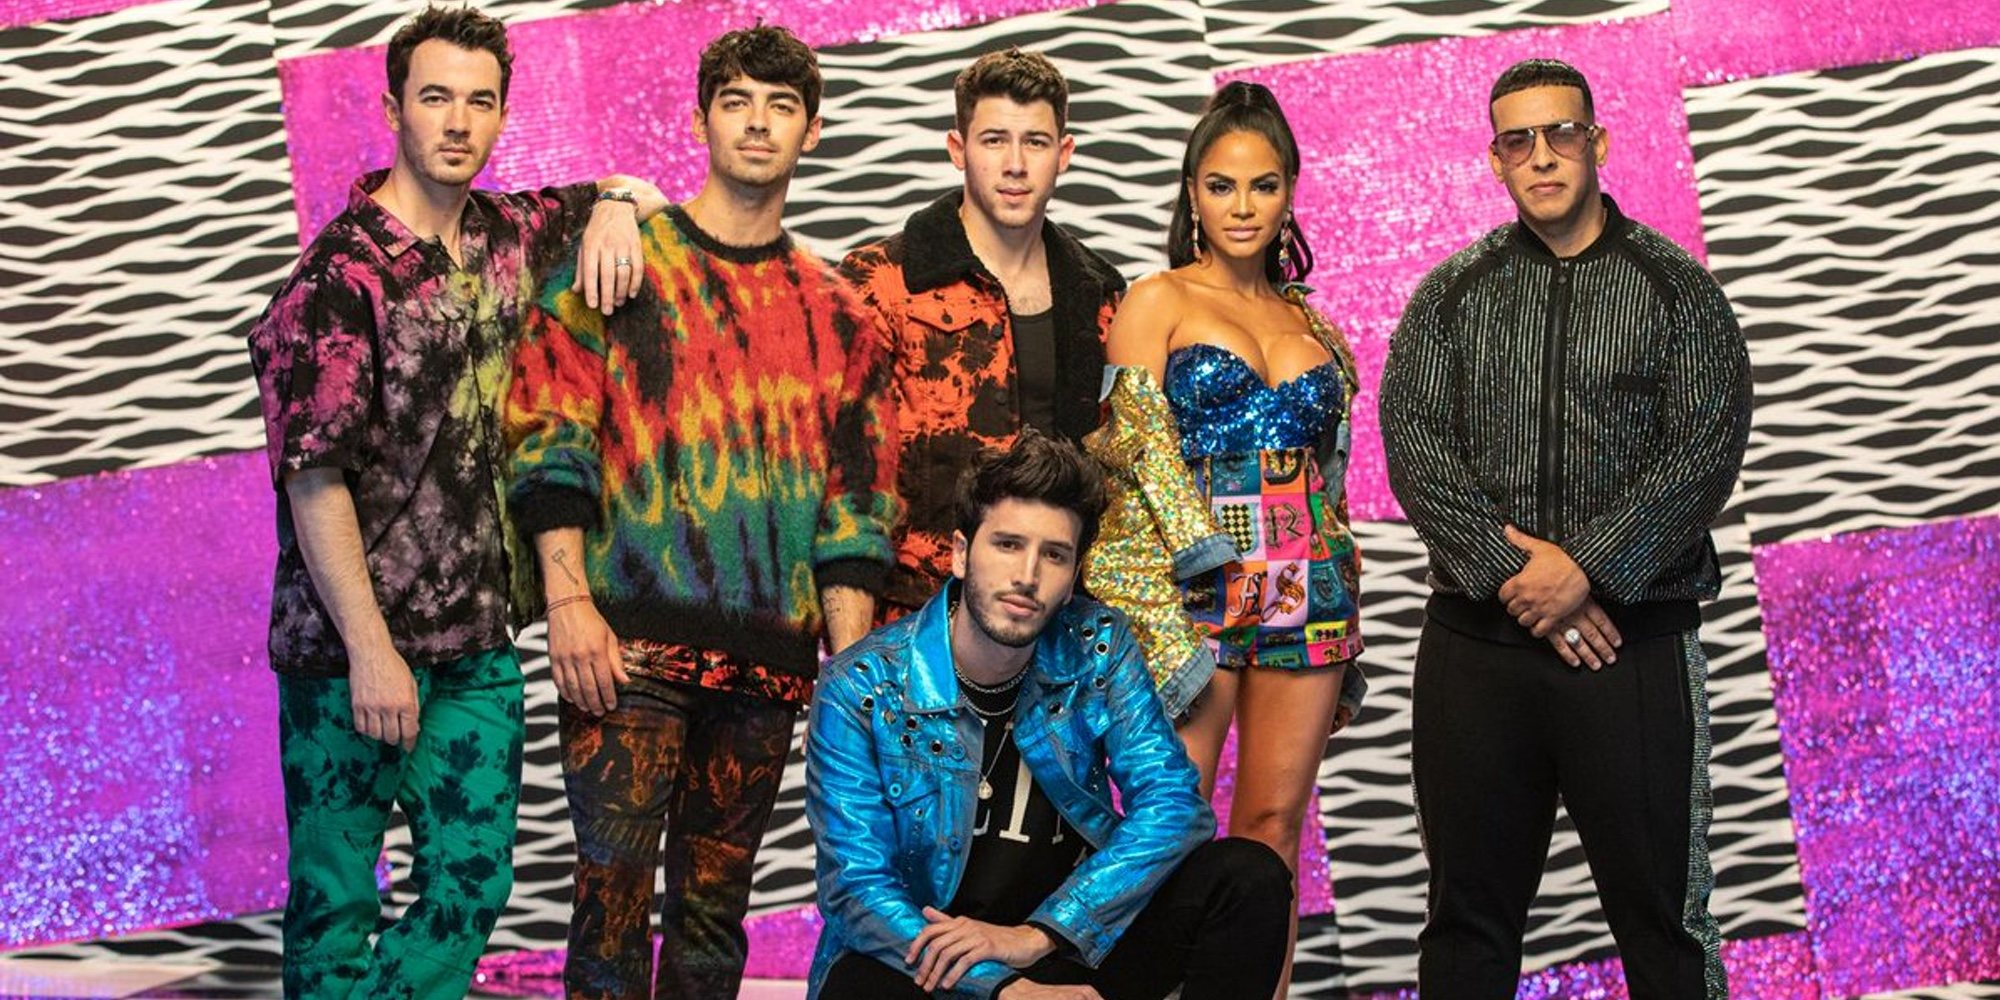 'Runaway': El divertido temazo de Sebastián Yatra, Daddy Yankee, Natti Natasha con los Jonas Brothers